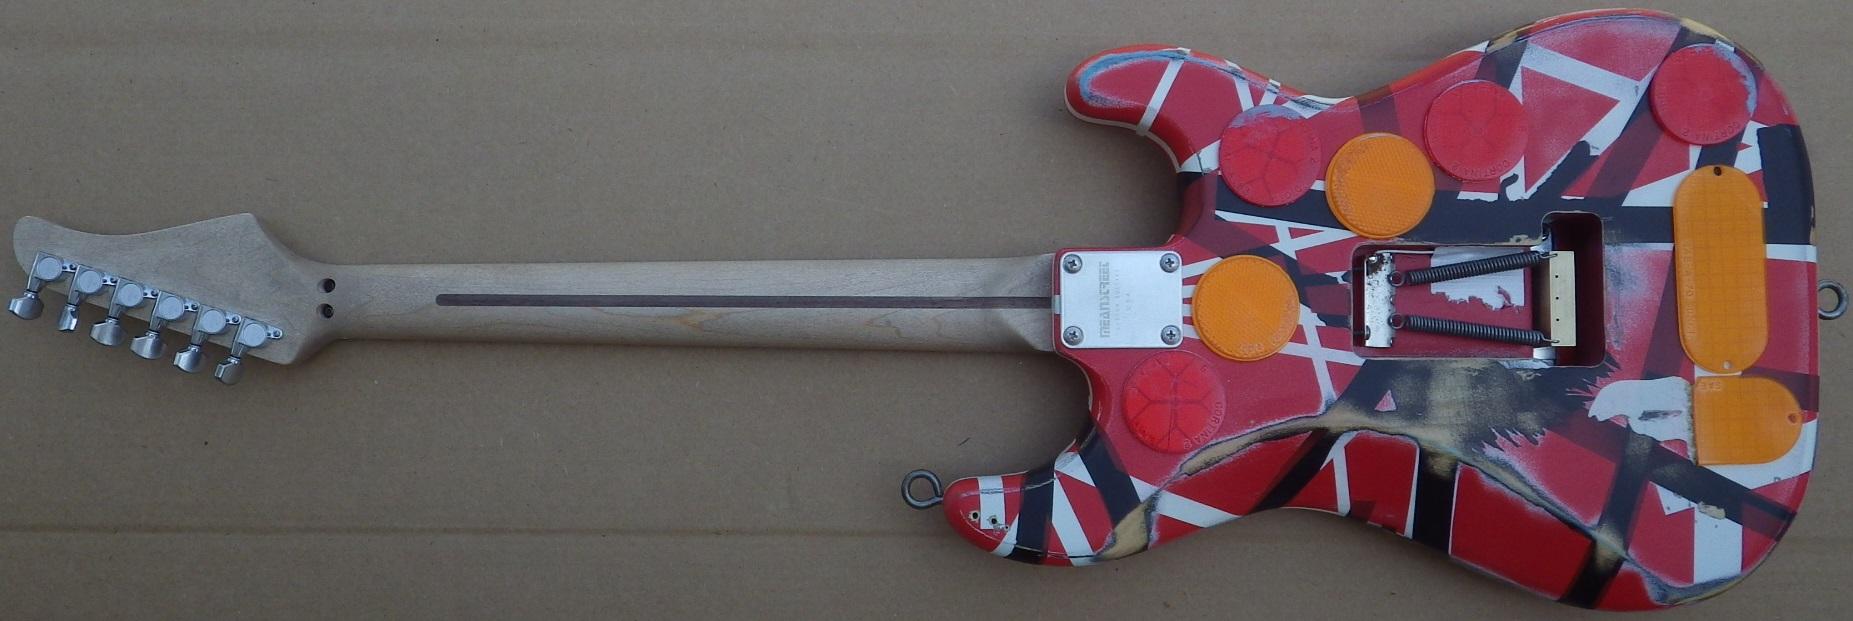 Mean Street Guitars Tour Model Franky Louie D pic 3.jpg